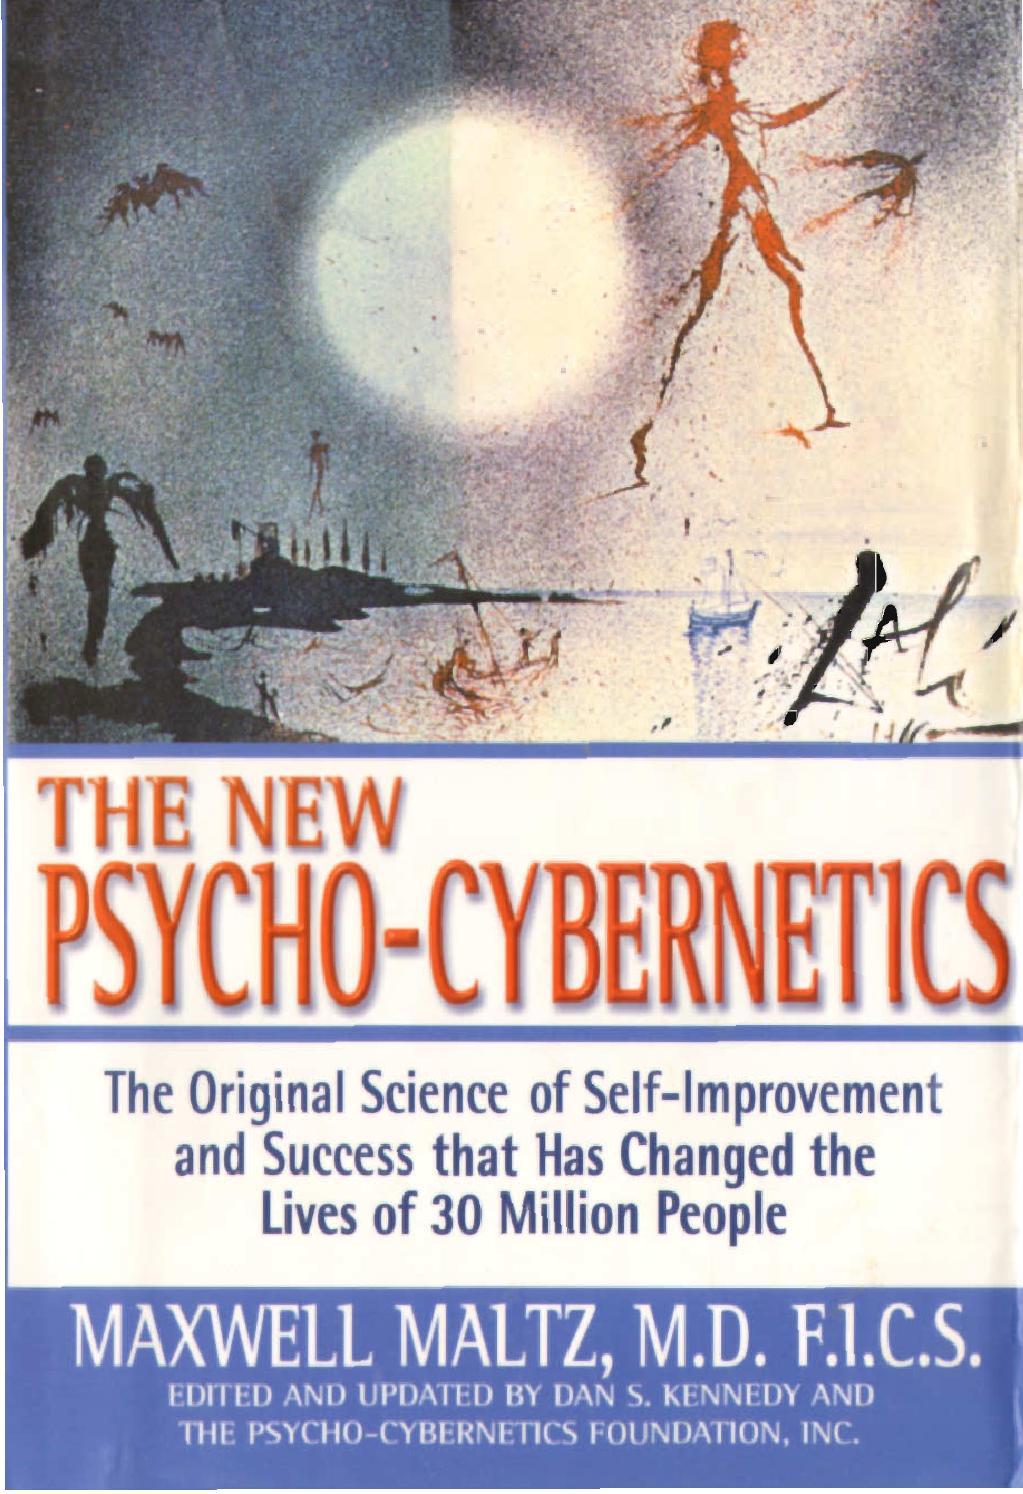 Dr maxwell maltz the new psycho-cybernetics pdf